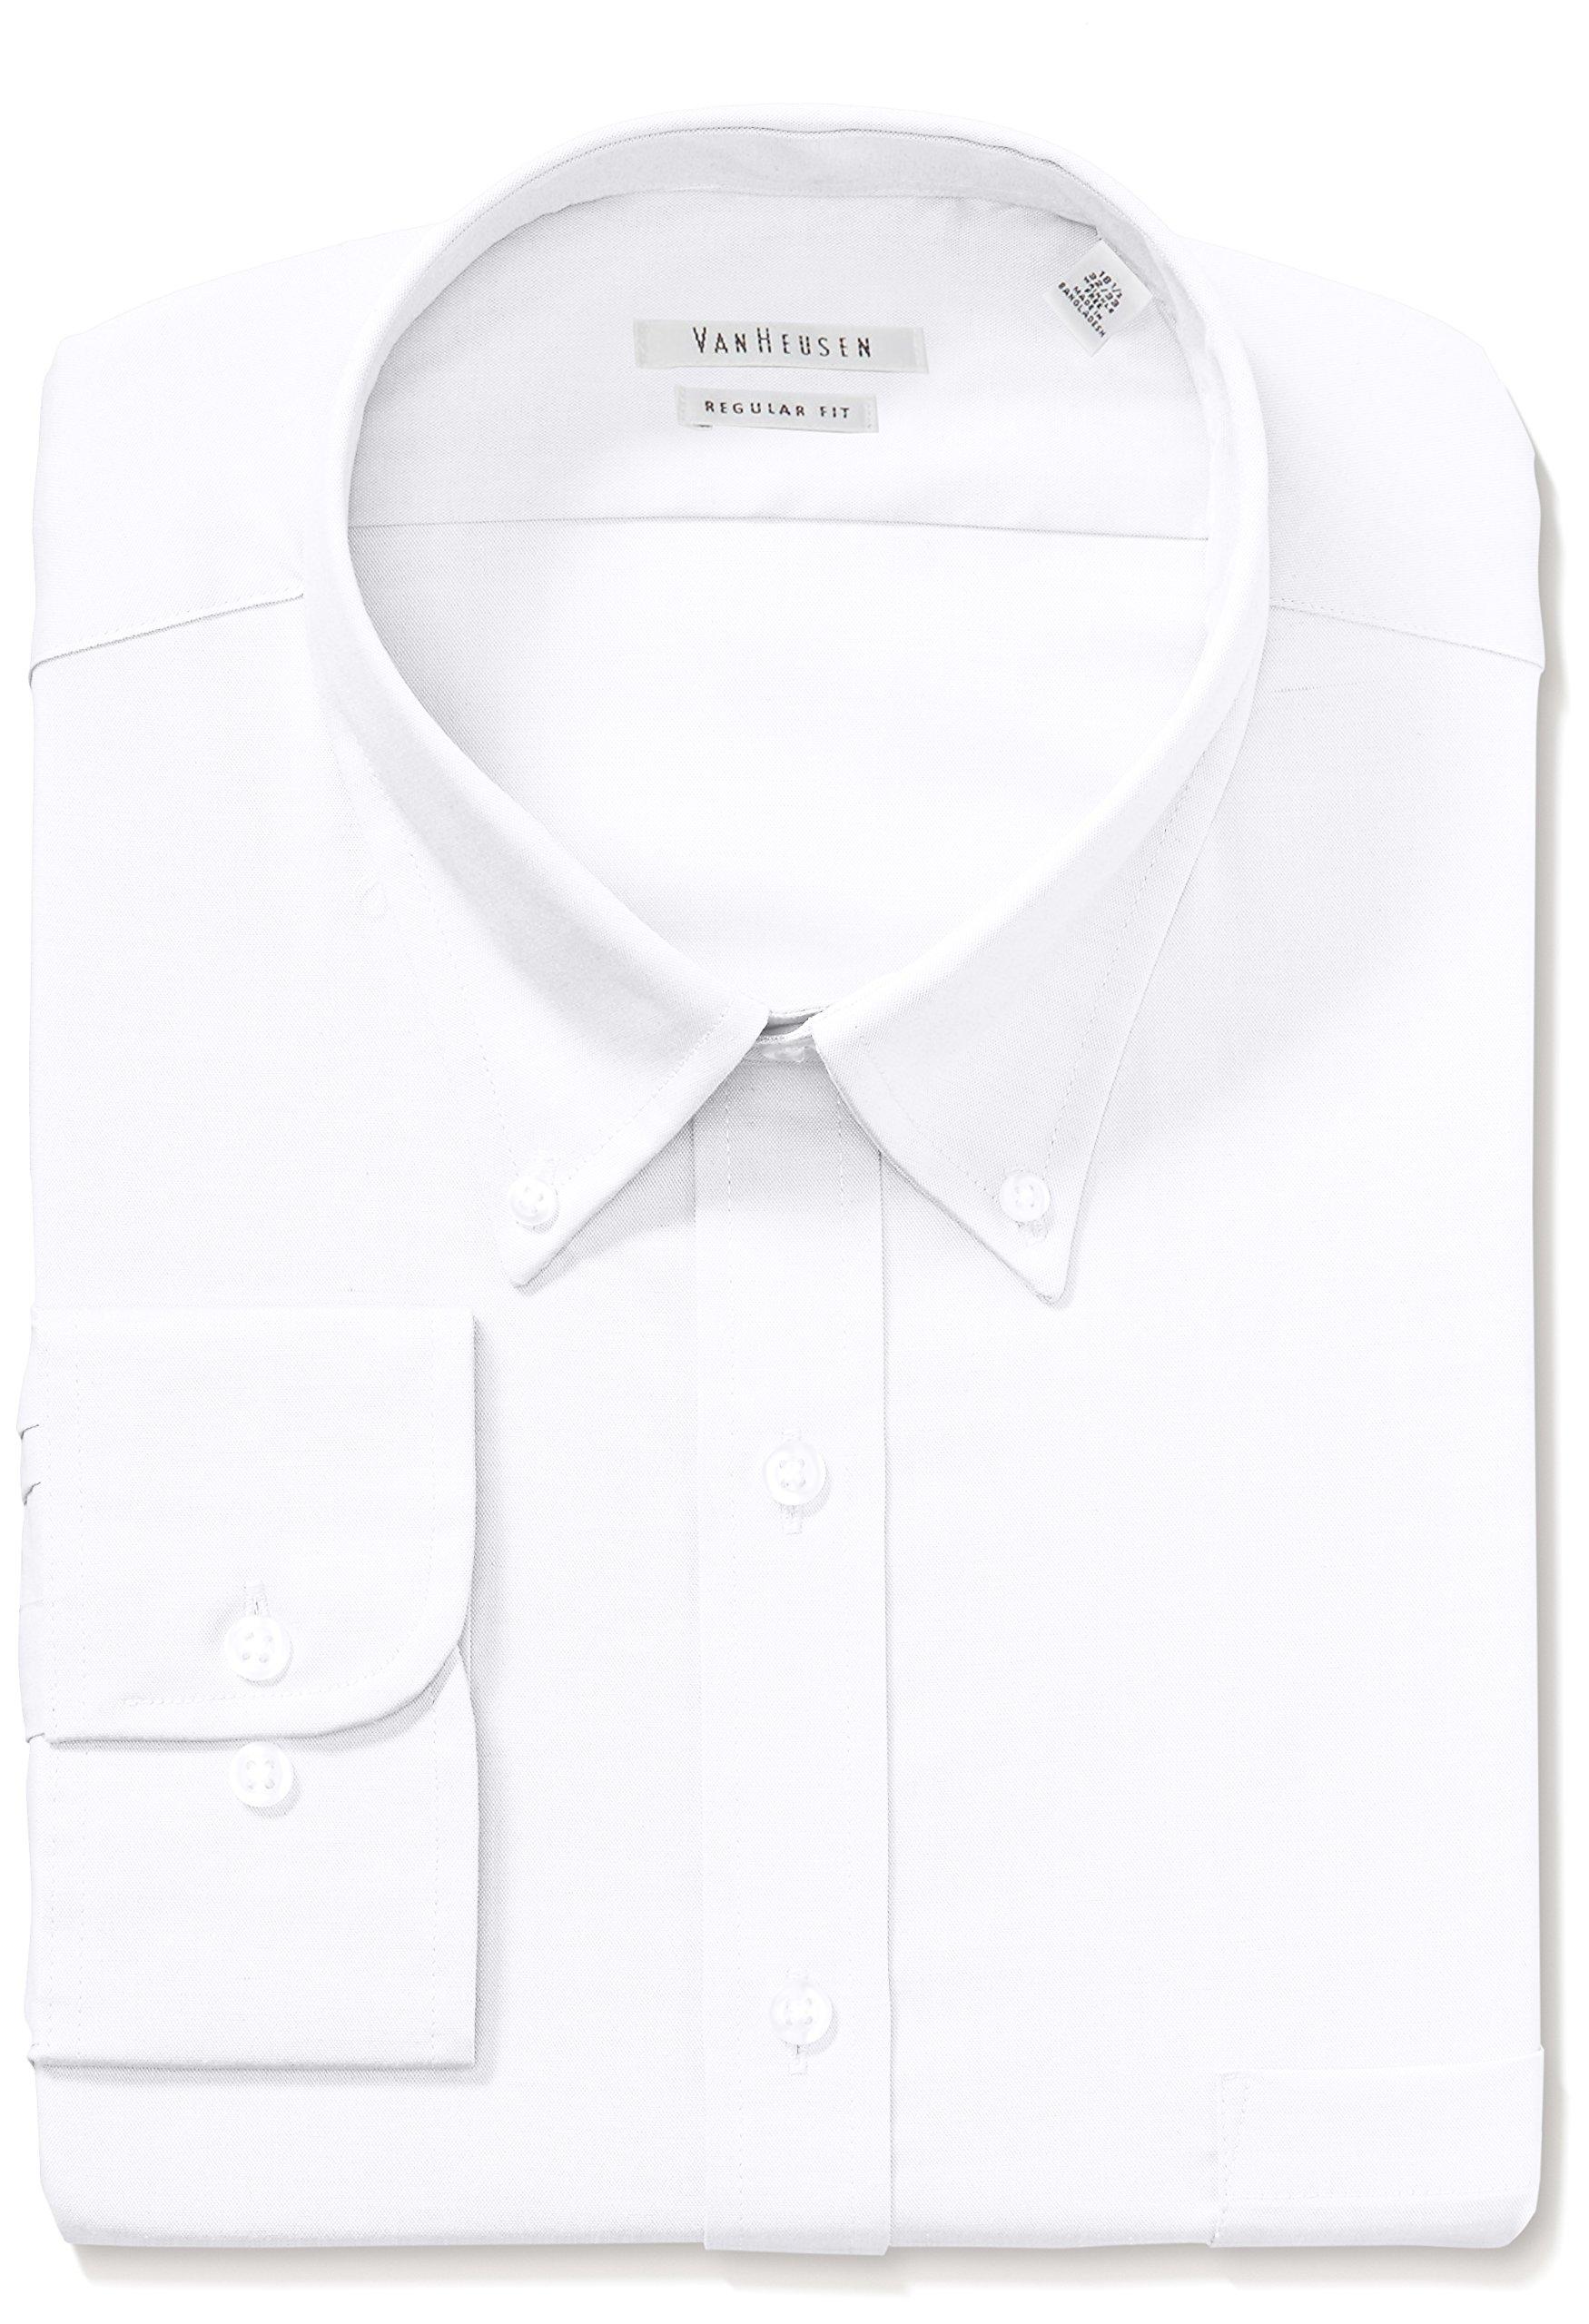 Van Heusen Men's Pinpoint Regular Fit Solid Button Down Collar Dress Shirt, White, 16.5'' Neck 34''-35'' Sleeve by Van Heusen